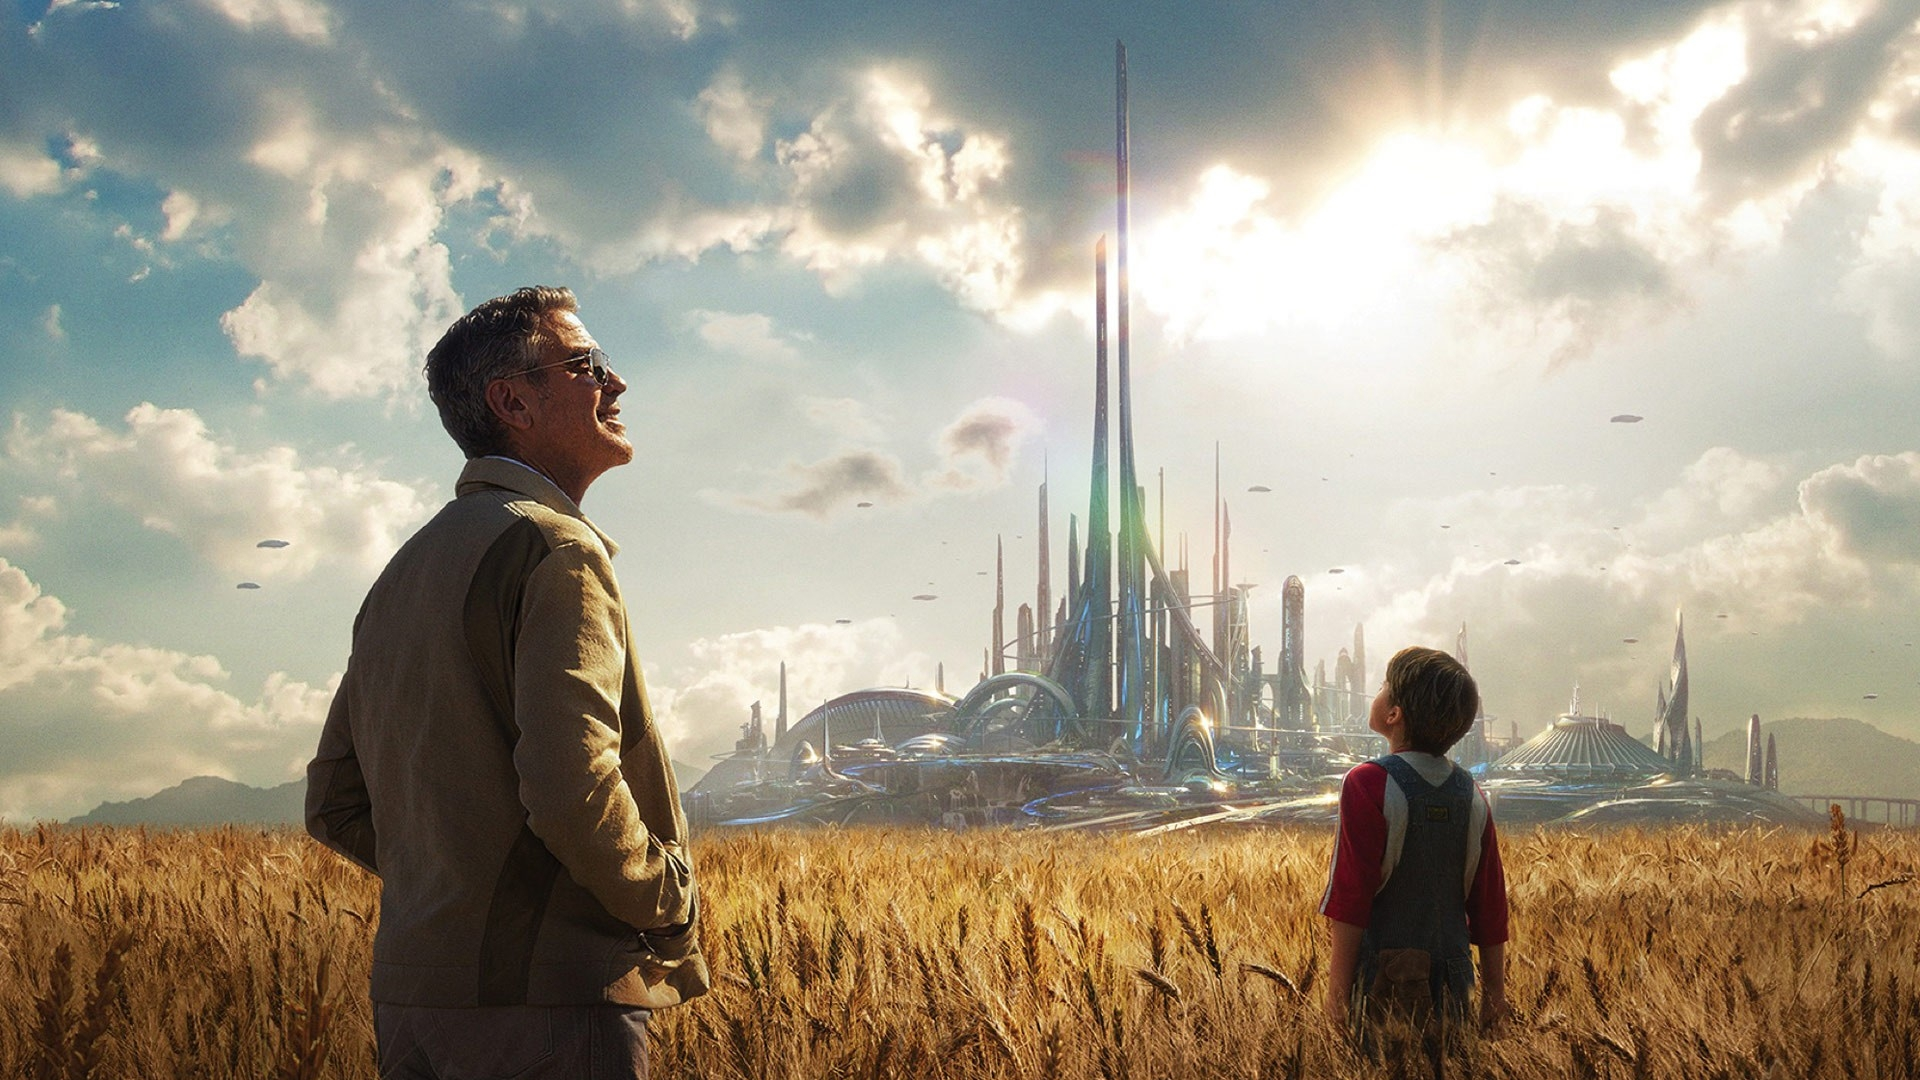 wide-tomorrowland-movie-2015-wallpaper.jpg